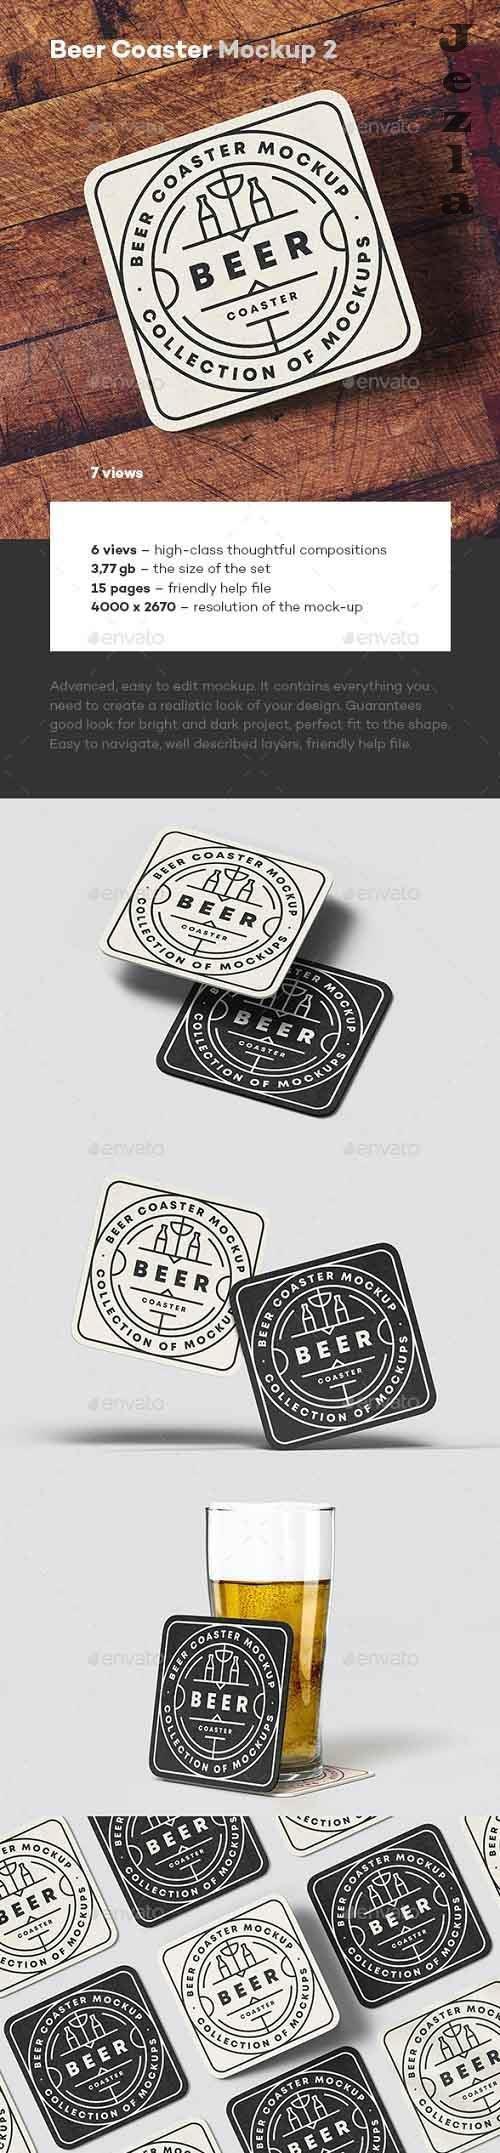 GraphicRiver - Beer Coaster Mock-up 2 28821829